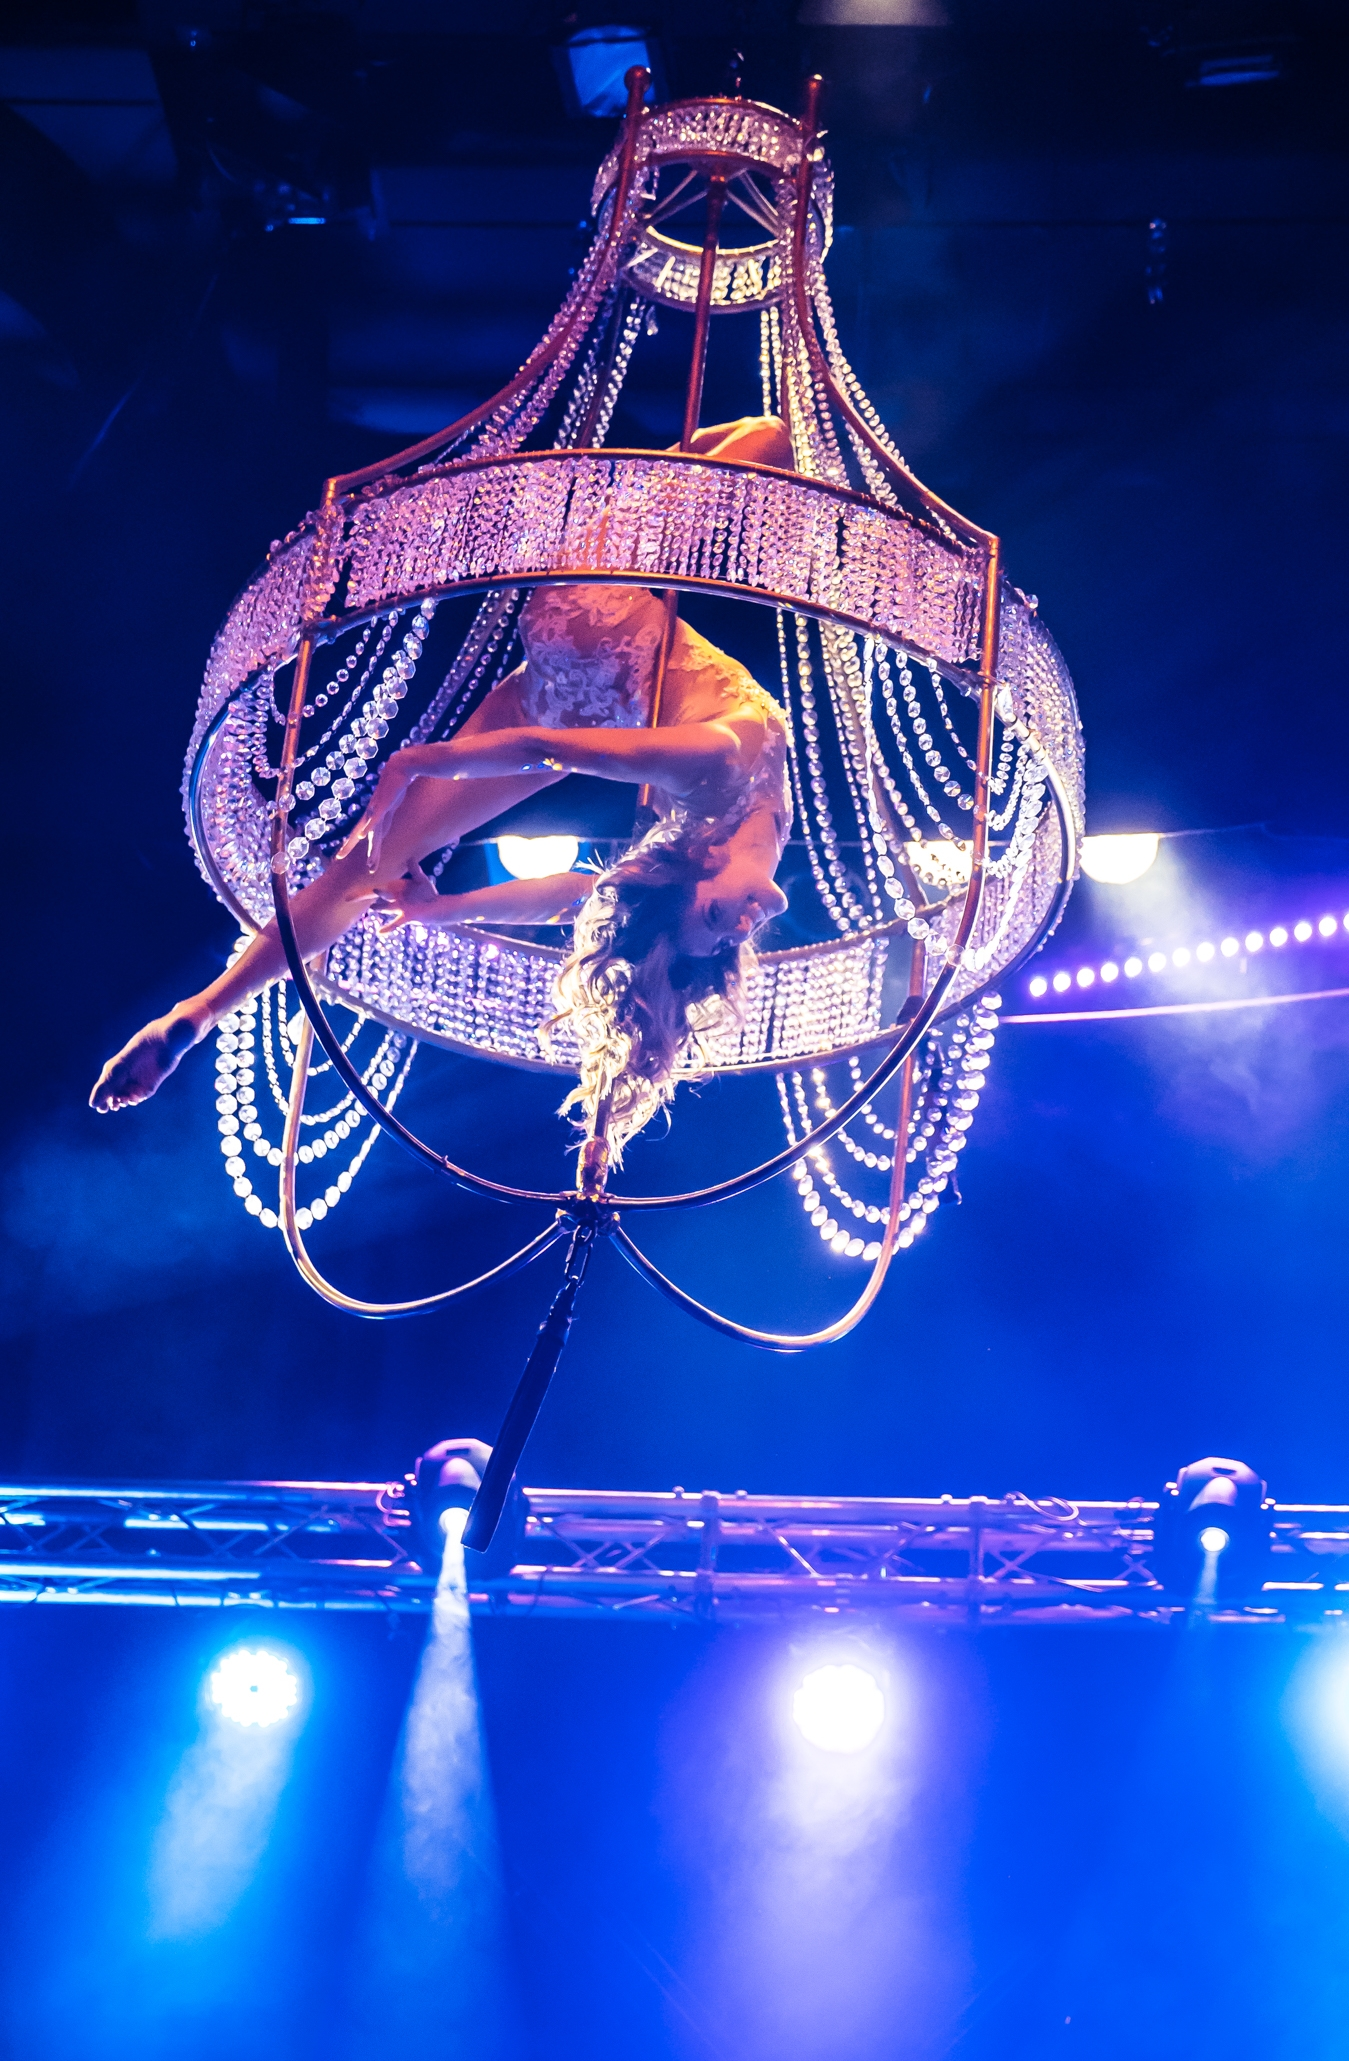 Aerial Chandelier - Kronleuchter Luftartistin - Flying Chandelier Showact - Air Candy Luftakrobatik Berlin